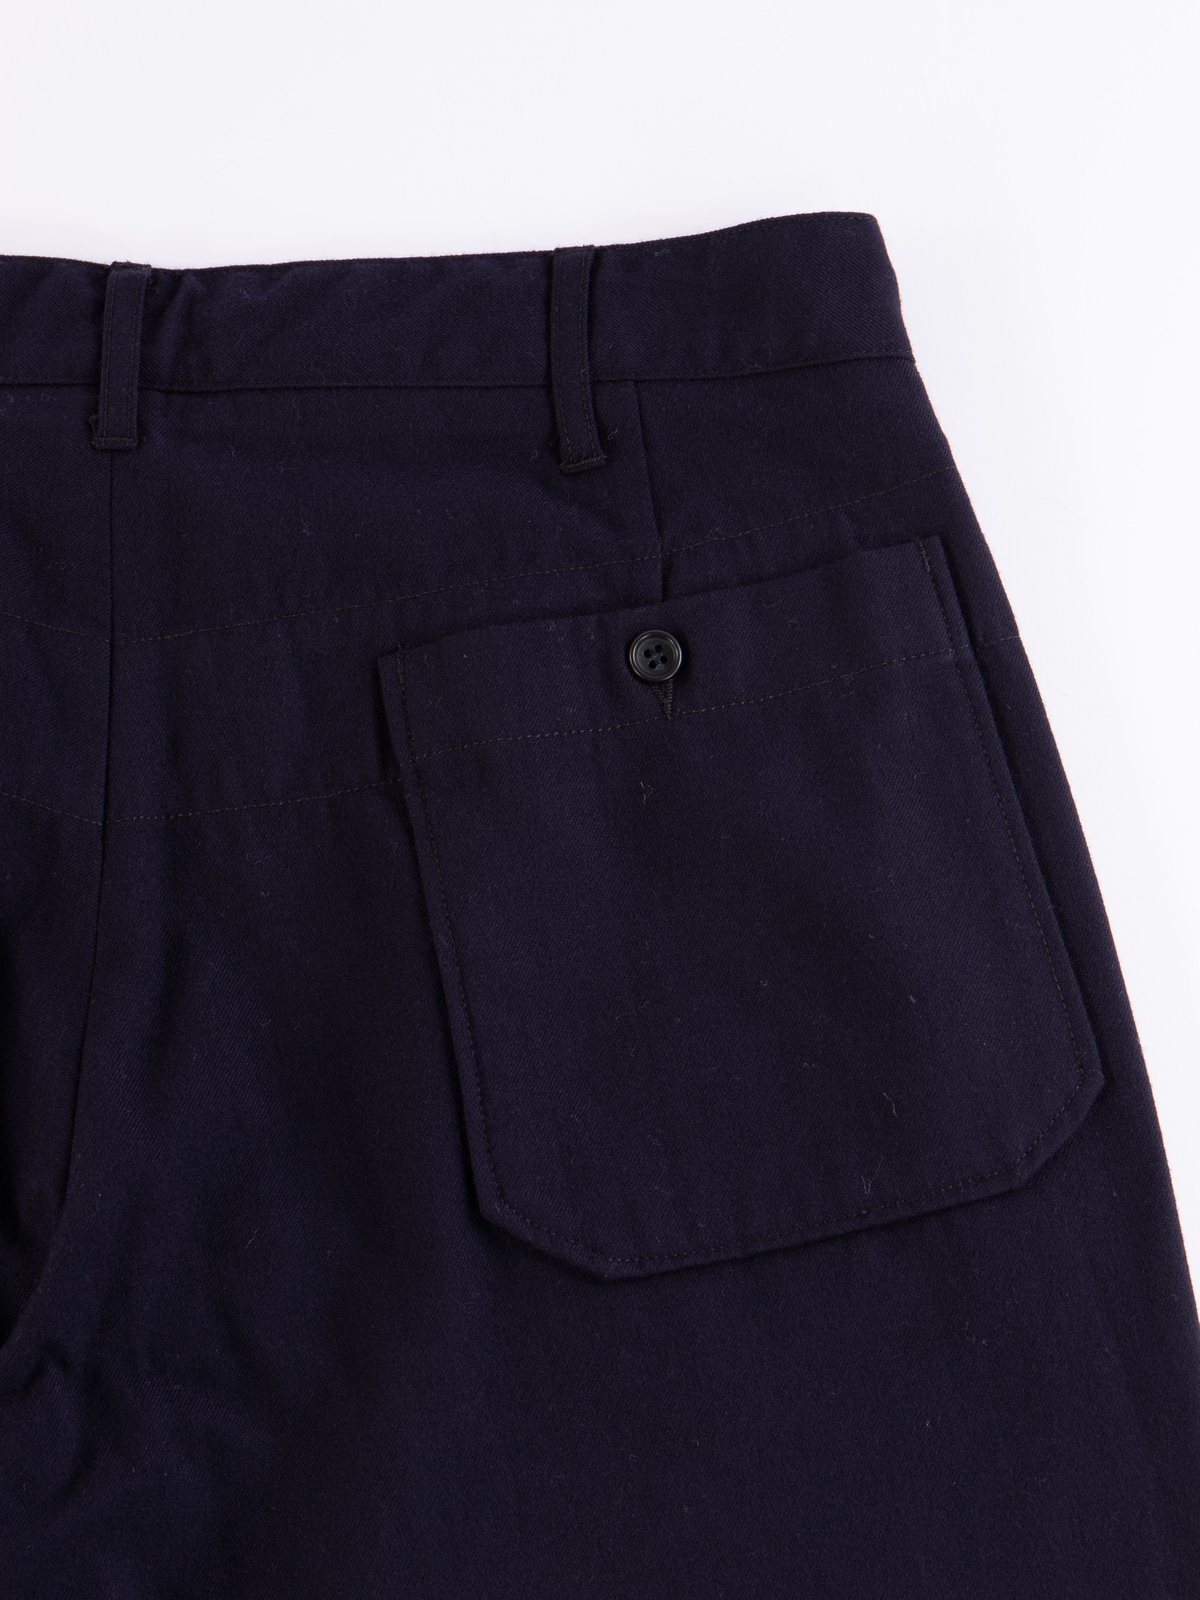 Dark Navy Wool Uniform Serge Carlyle Pant - Image 5